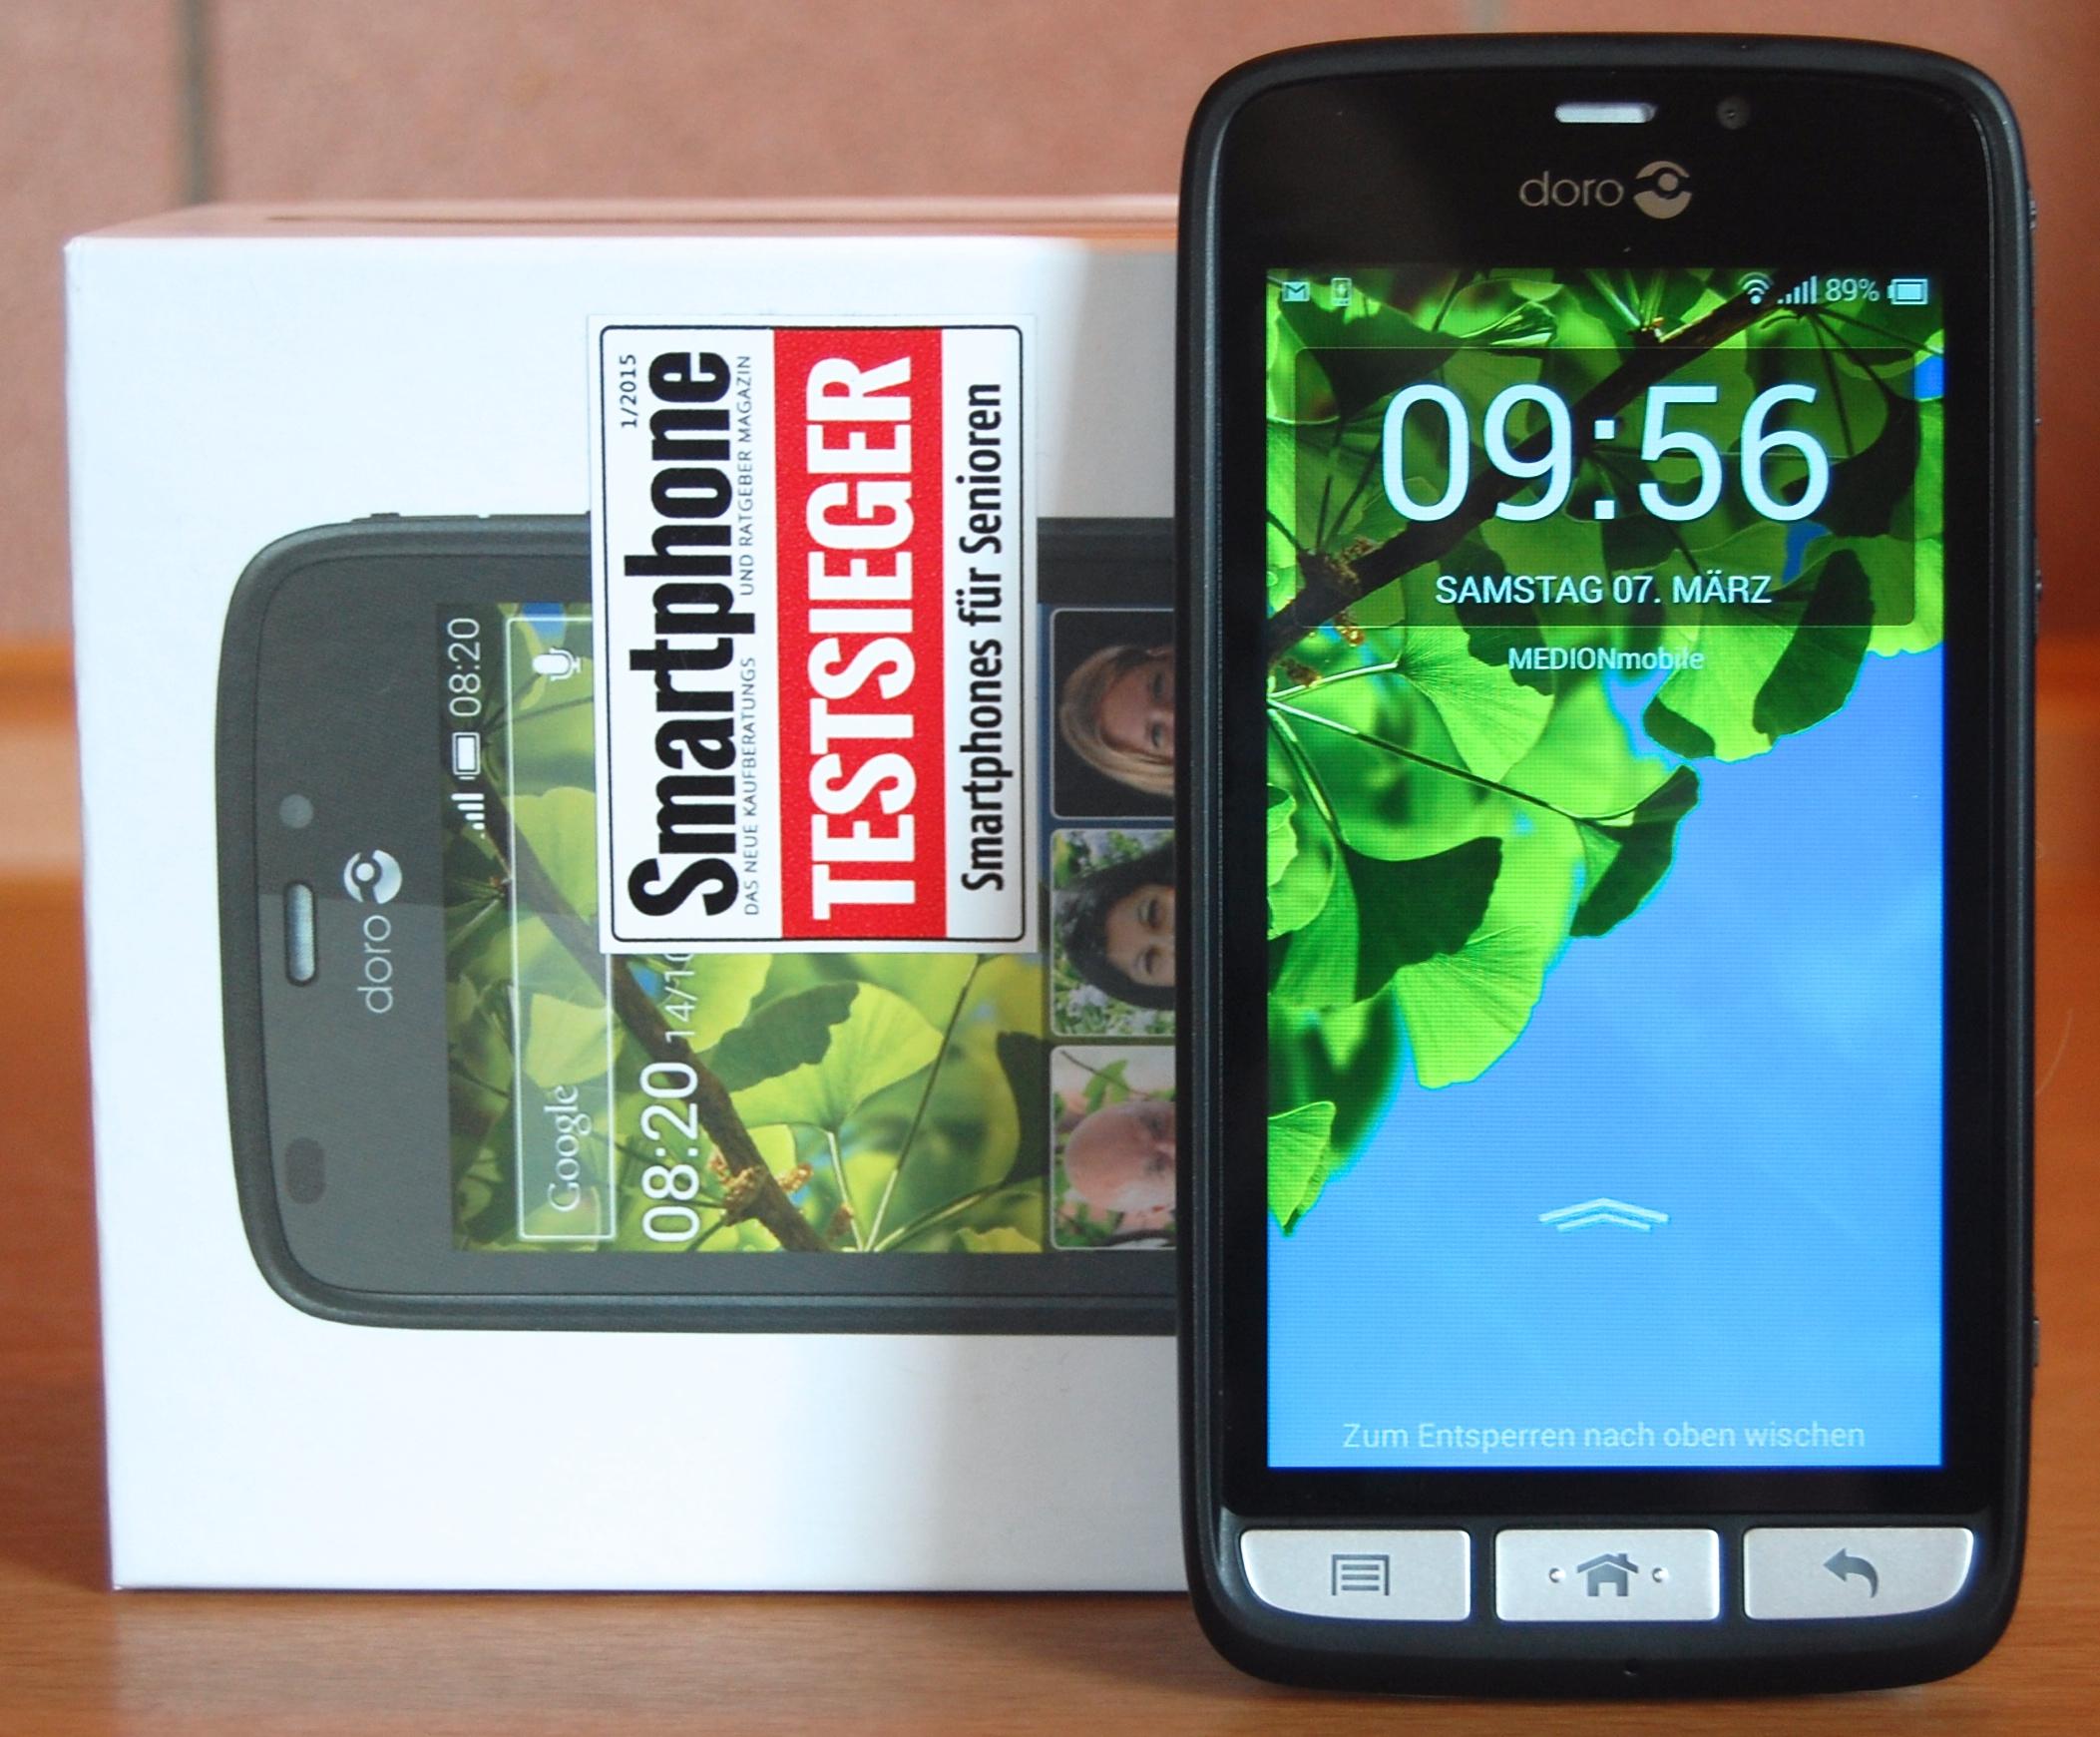 doro-liberto-820-senioren-smartphones